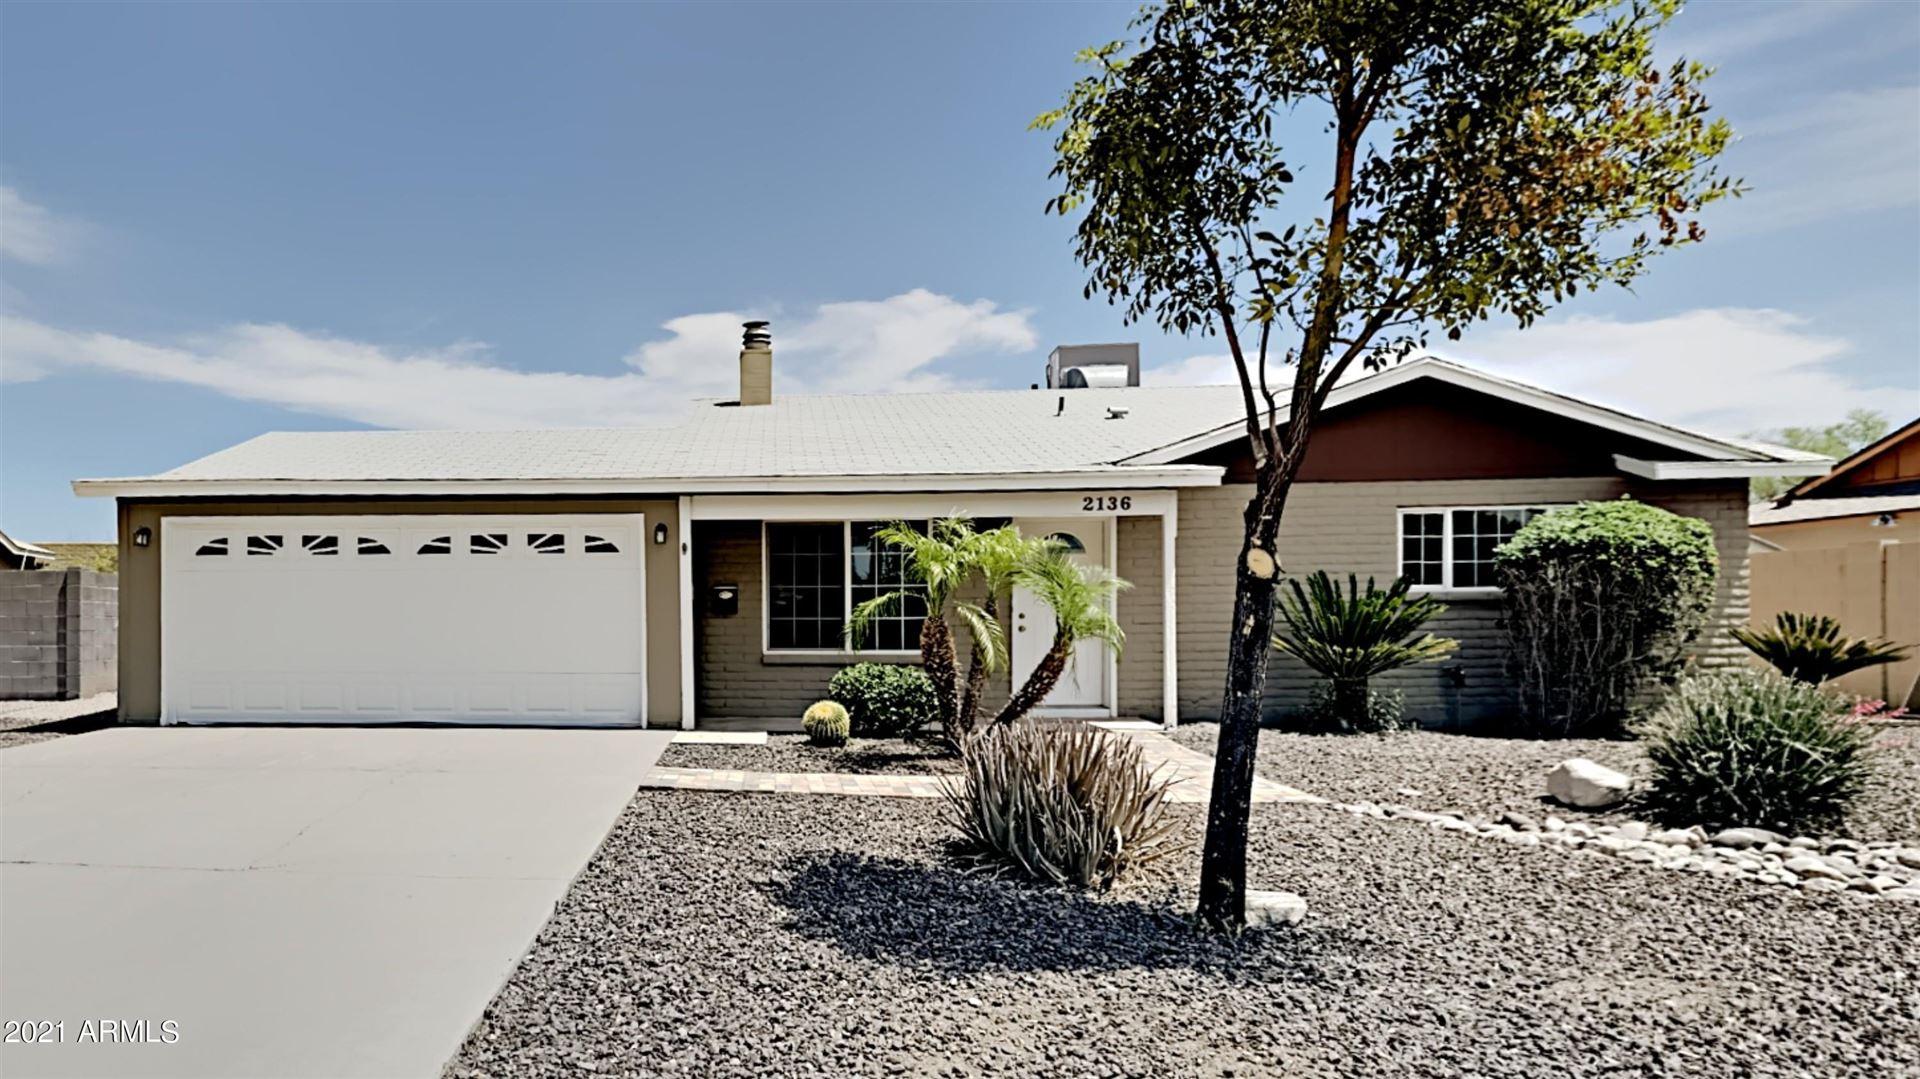 Photo of 2136 E GREENWAY Drive, Tempe, AZ 85282 (MLS # 6232246)